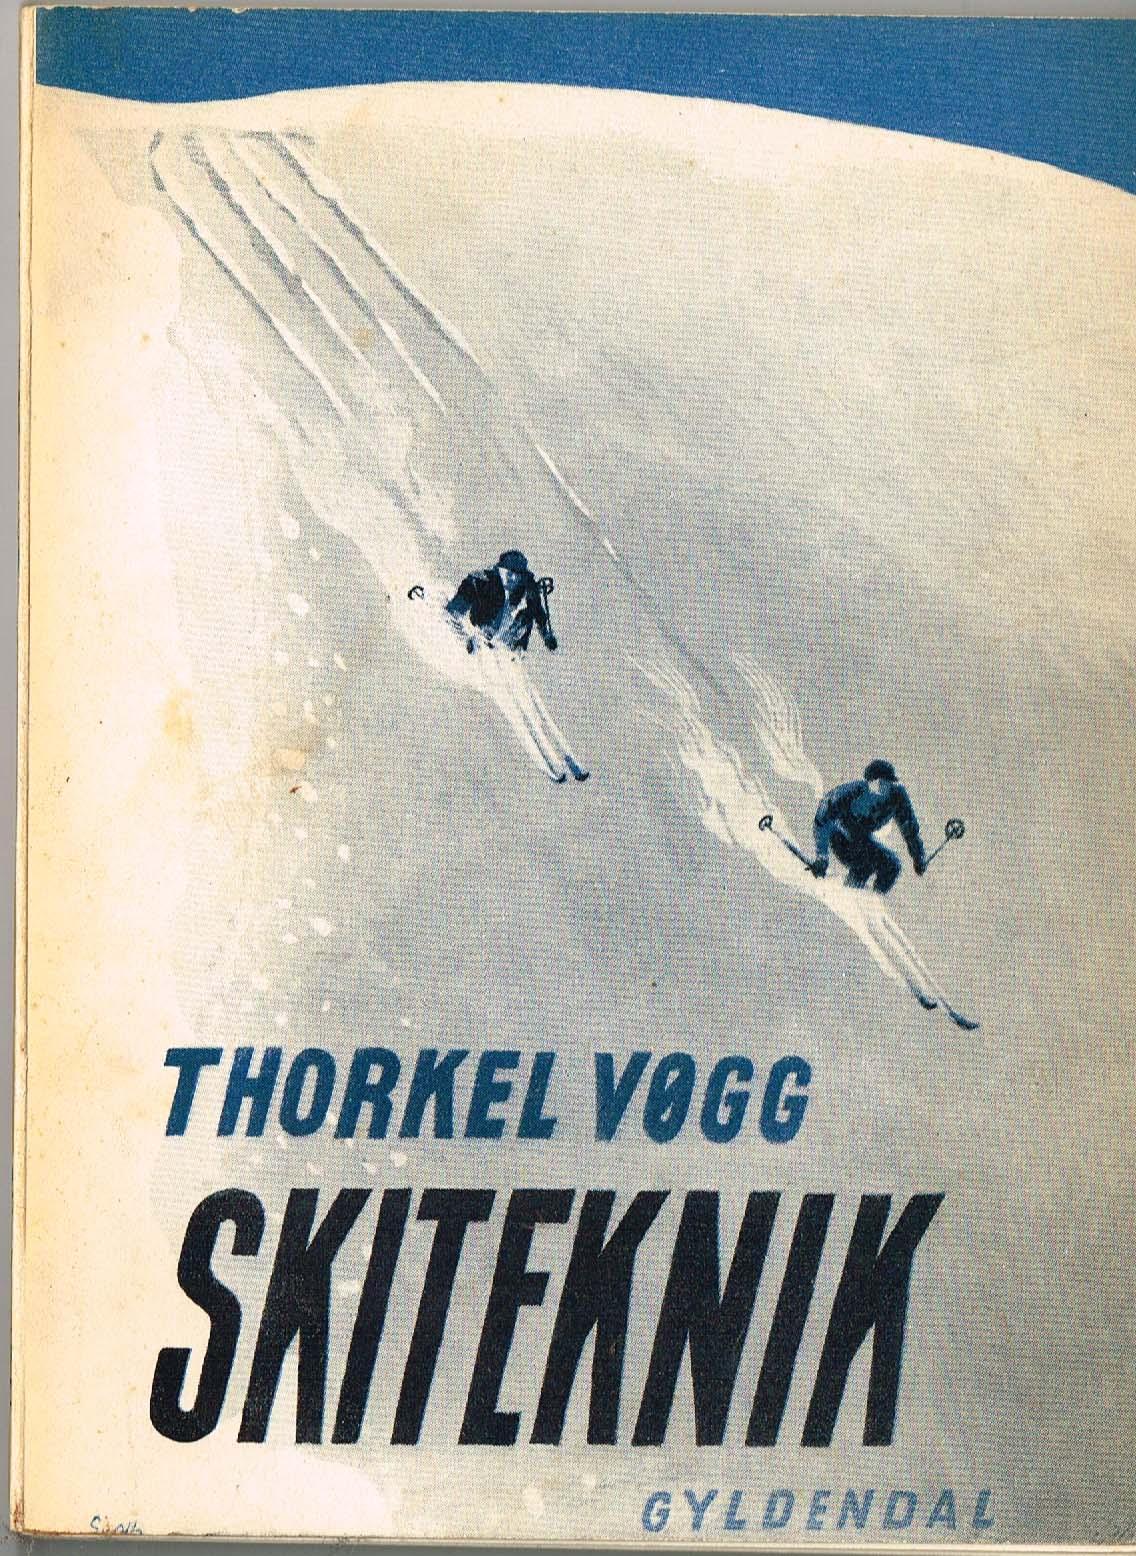 skiteknik skisport